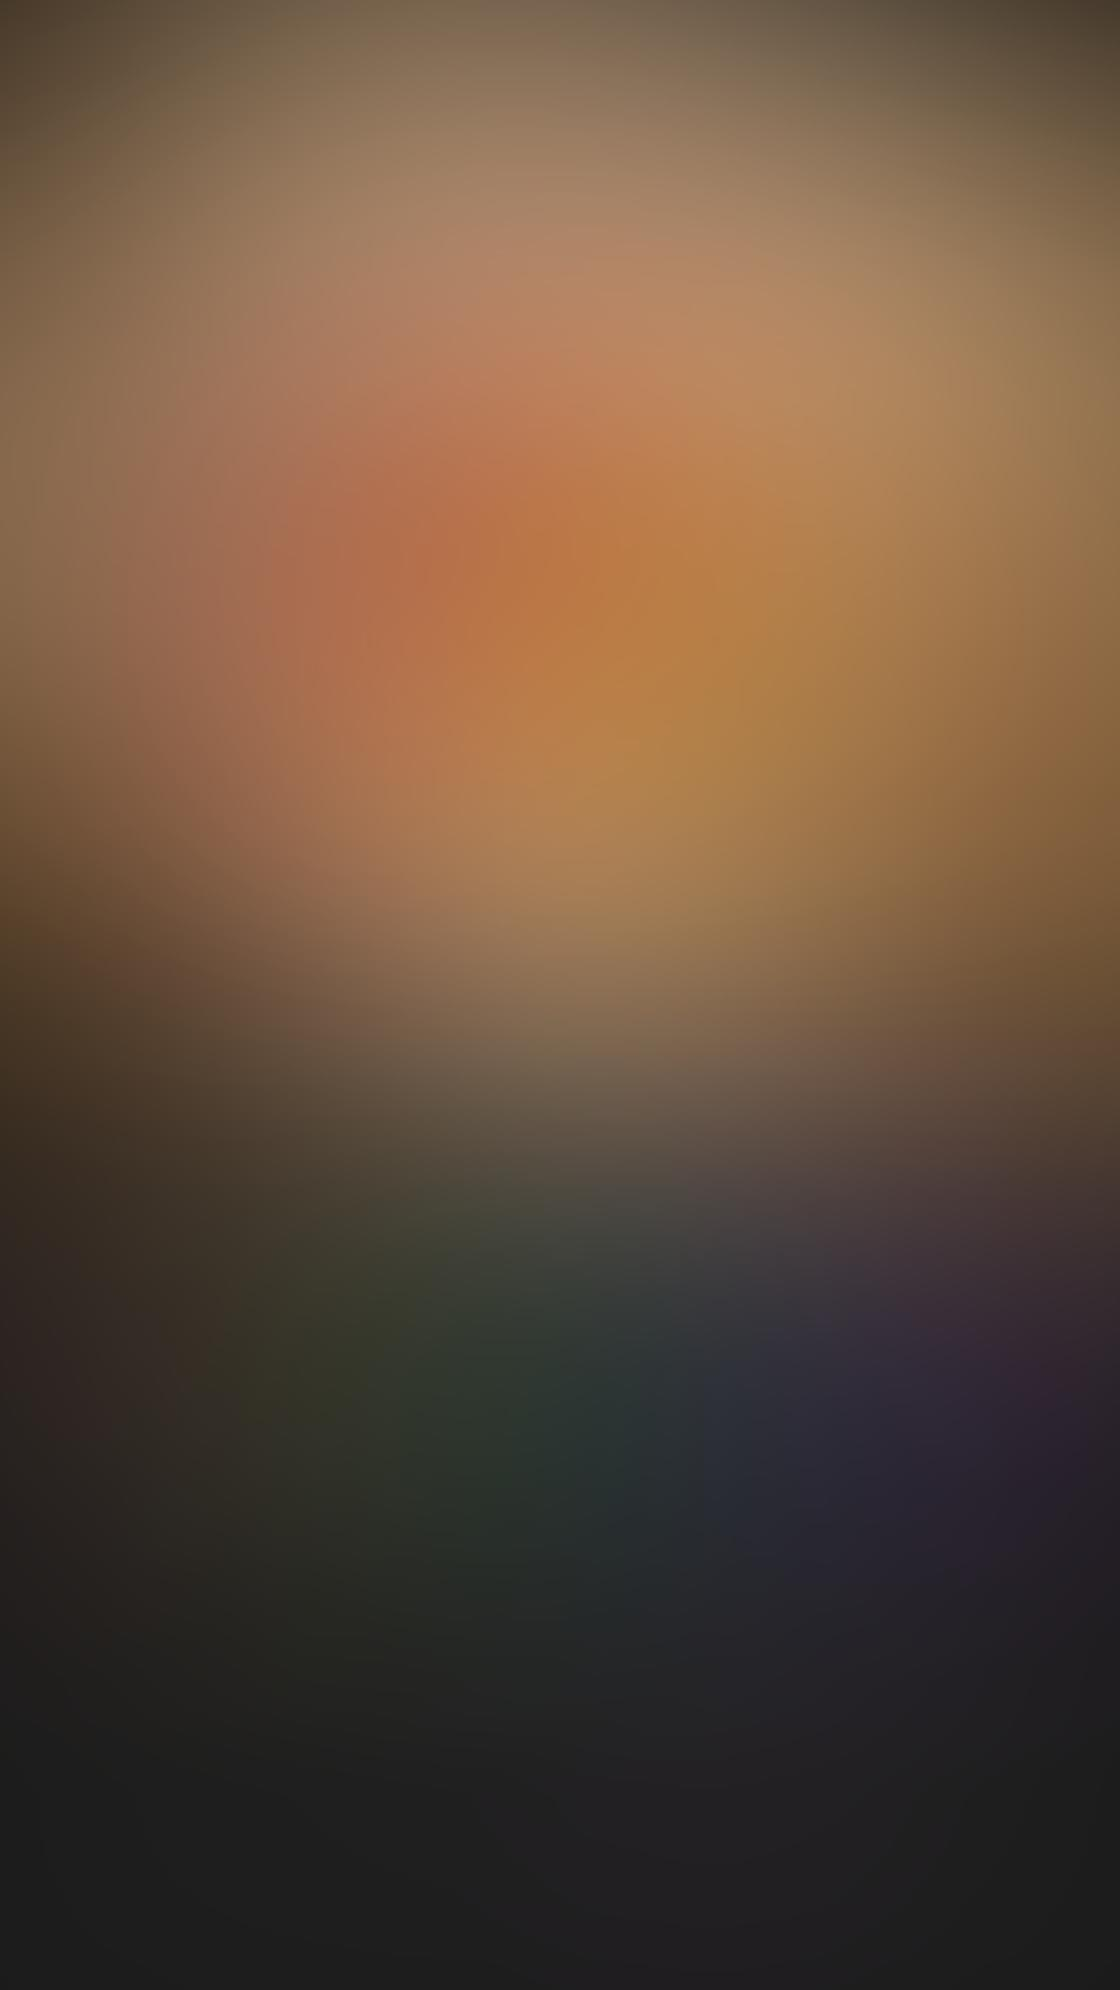 iPhone Photos Darkroom App 6